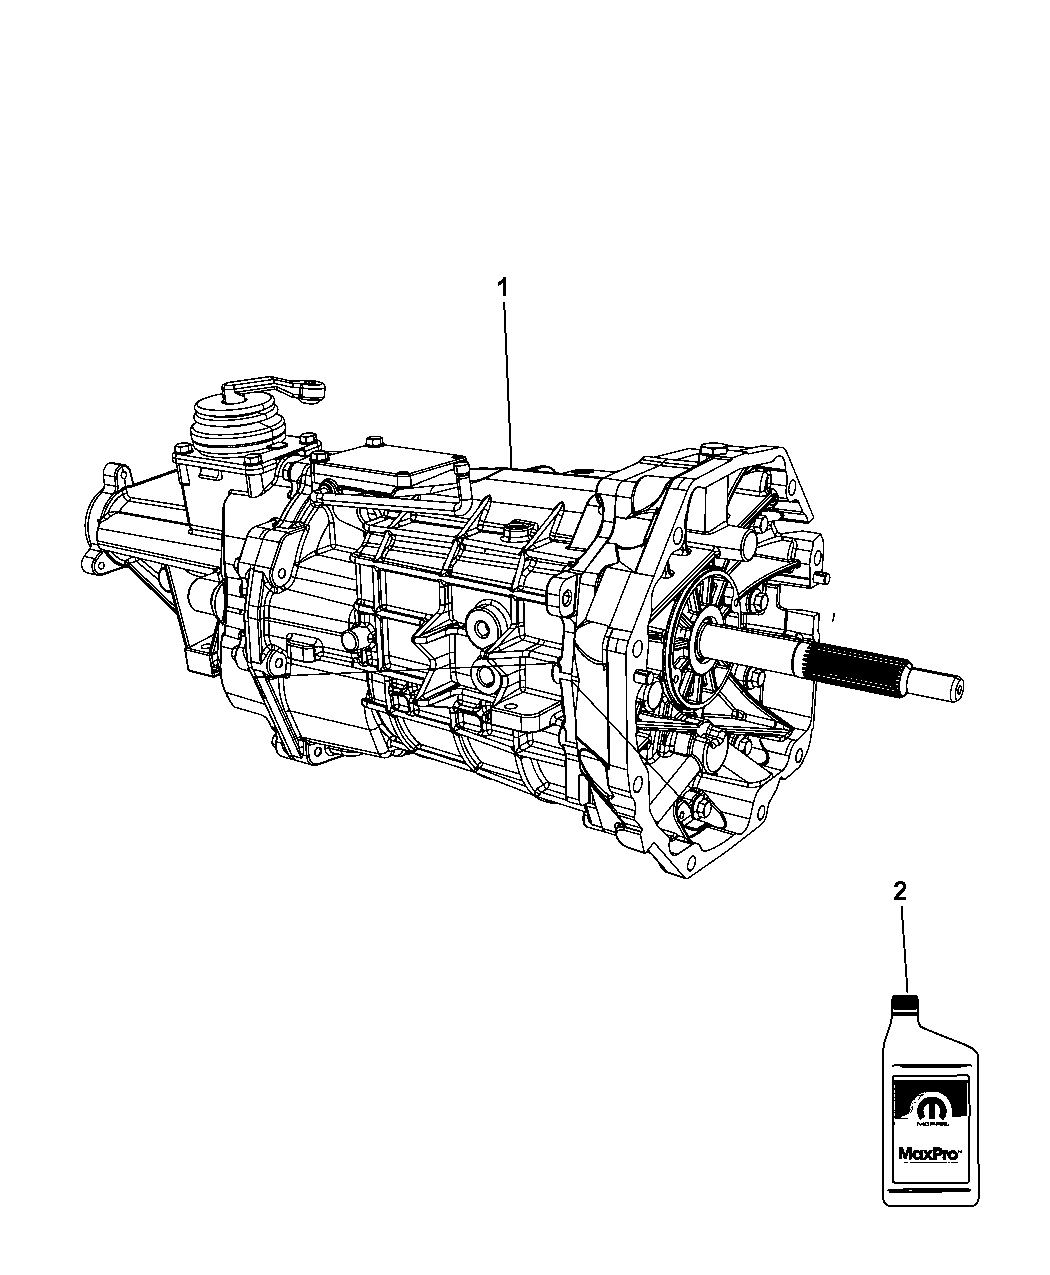 2008 Dodge Viper Transmission / Transaxle Assembly